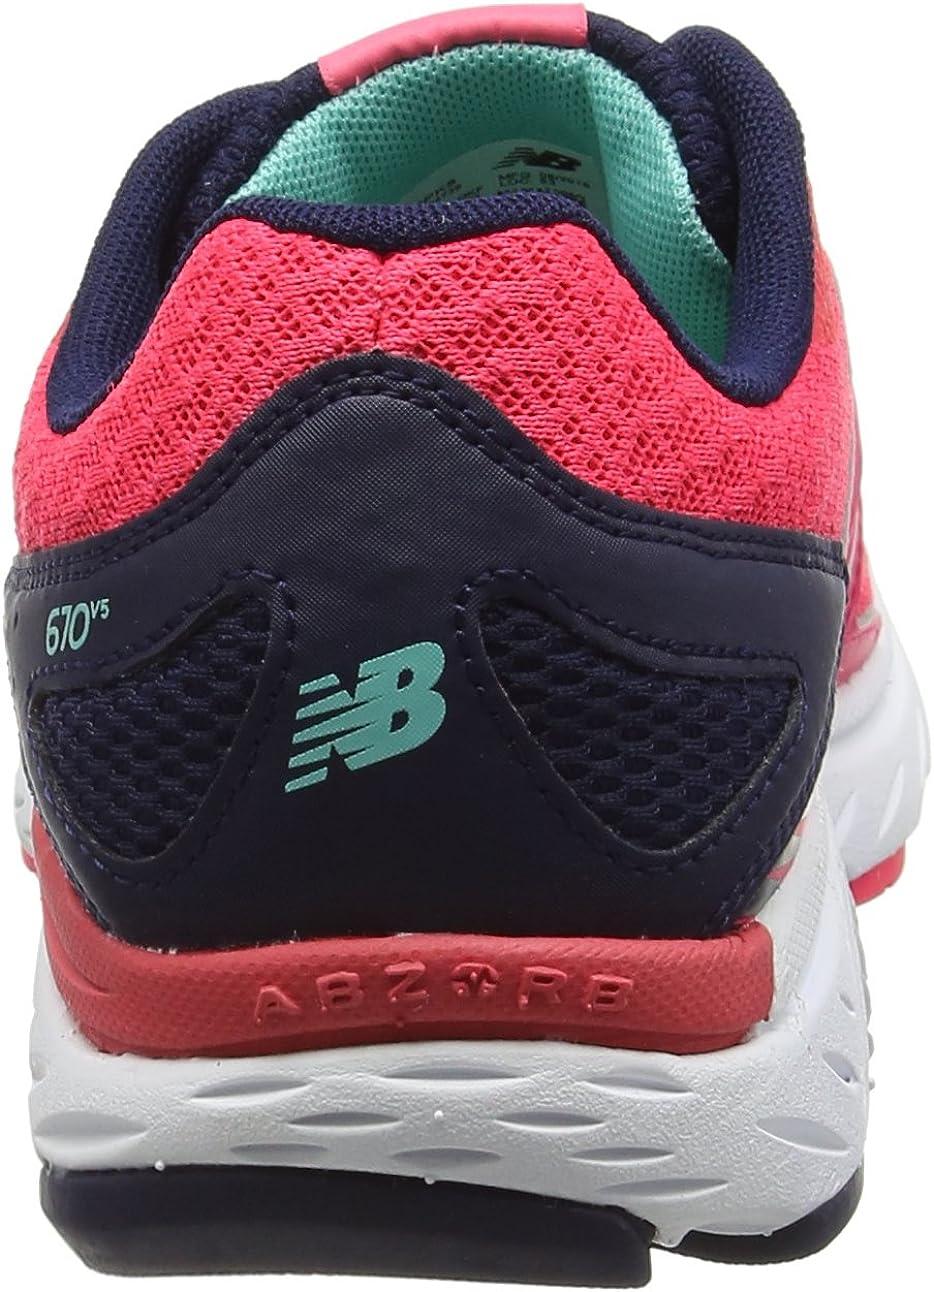 new balance 670v5